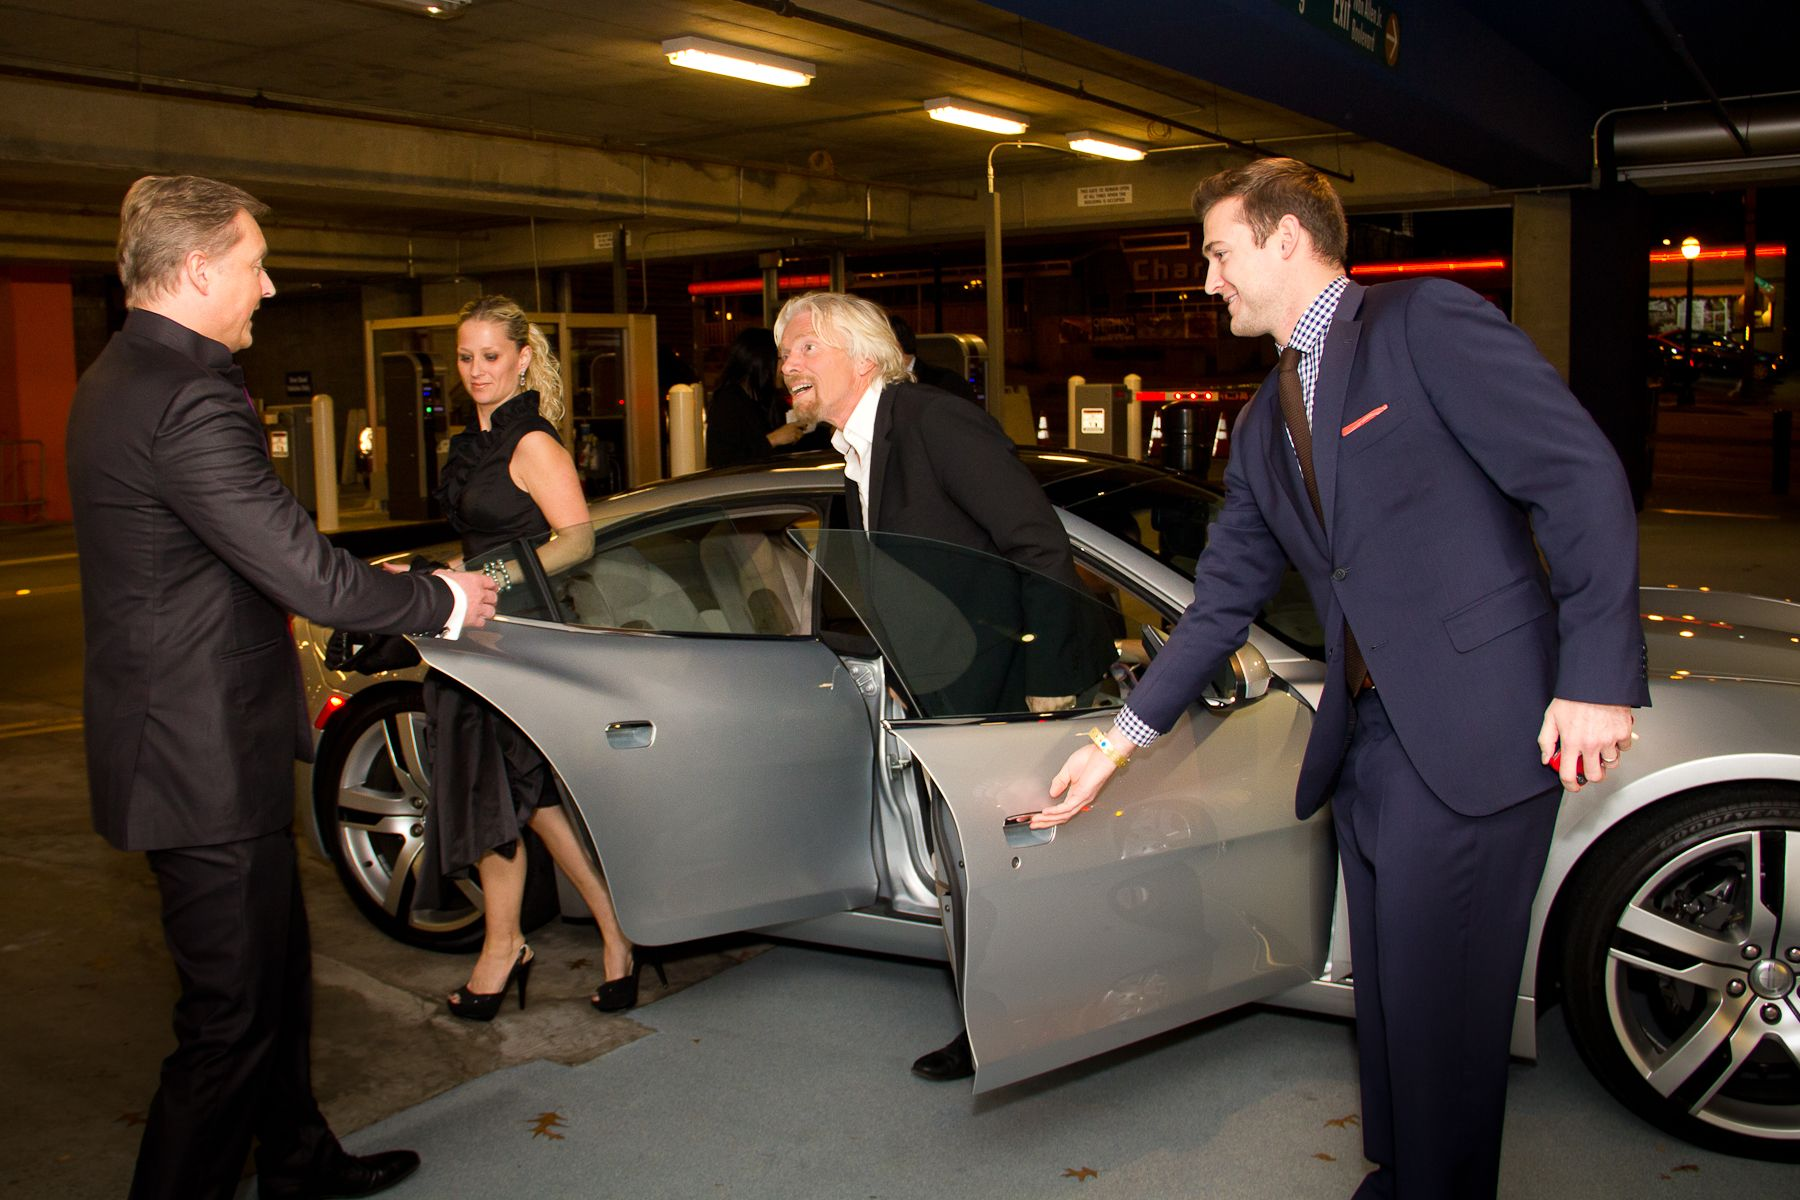 Sir Richard Branson in greeted by Henrik Fisker as he ...